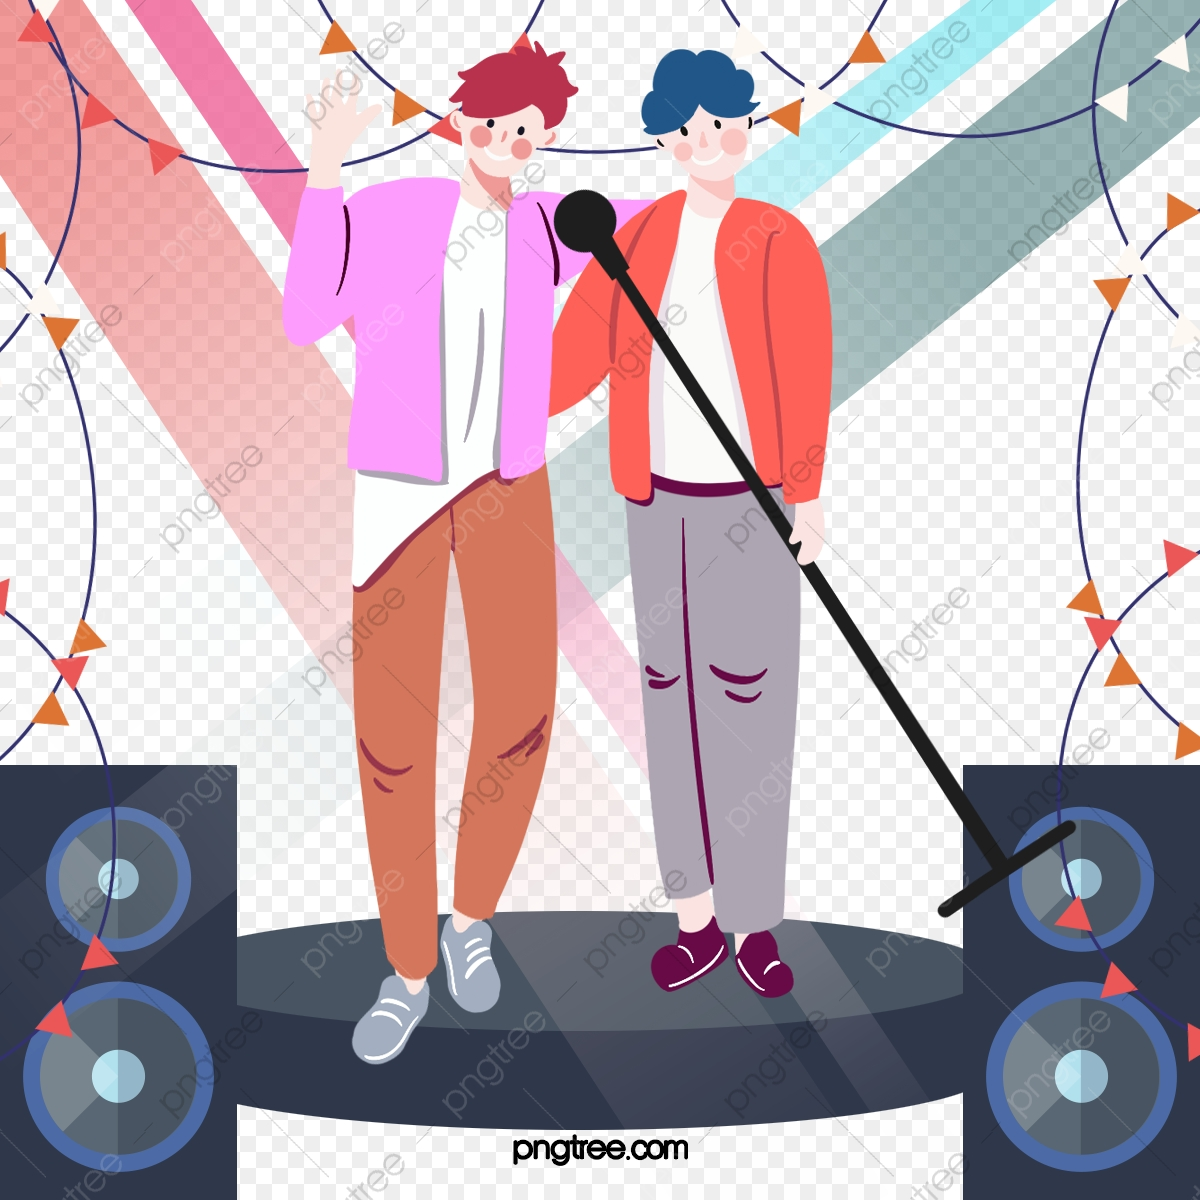 pngtree cartoon hand drawn stage singing music illustration png image 5337705